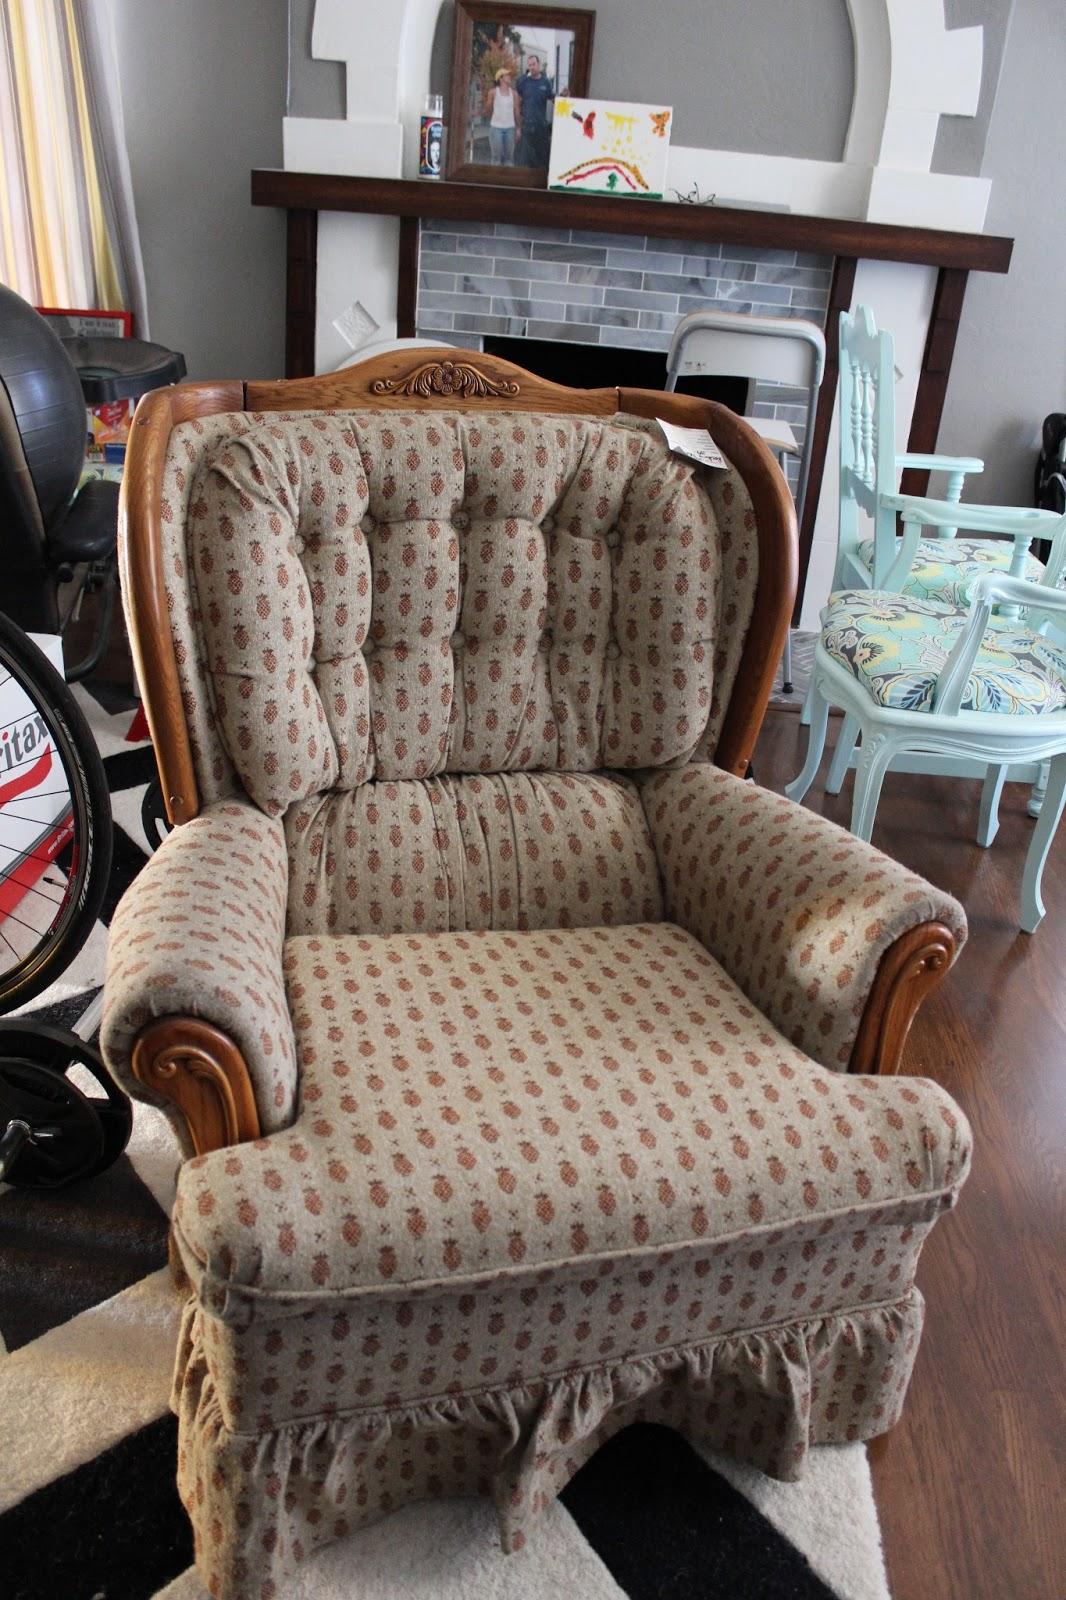 Houndstooth chair brown - Houndstooth Chair Brown